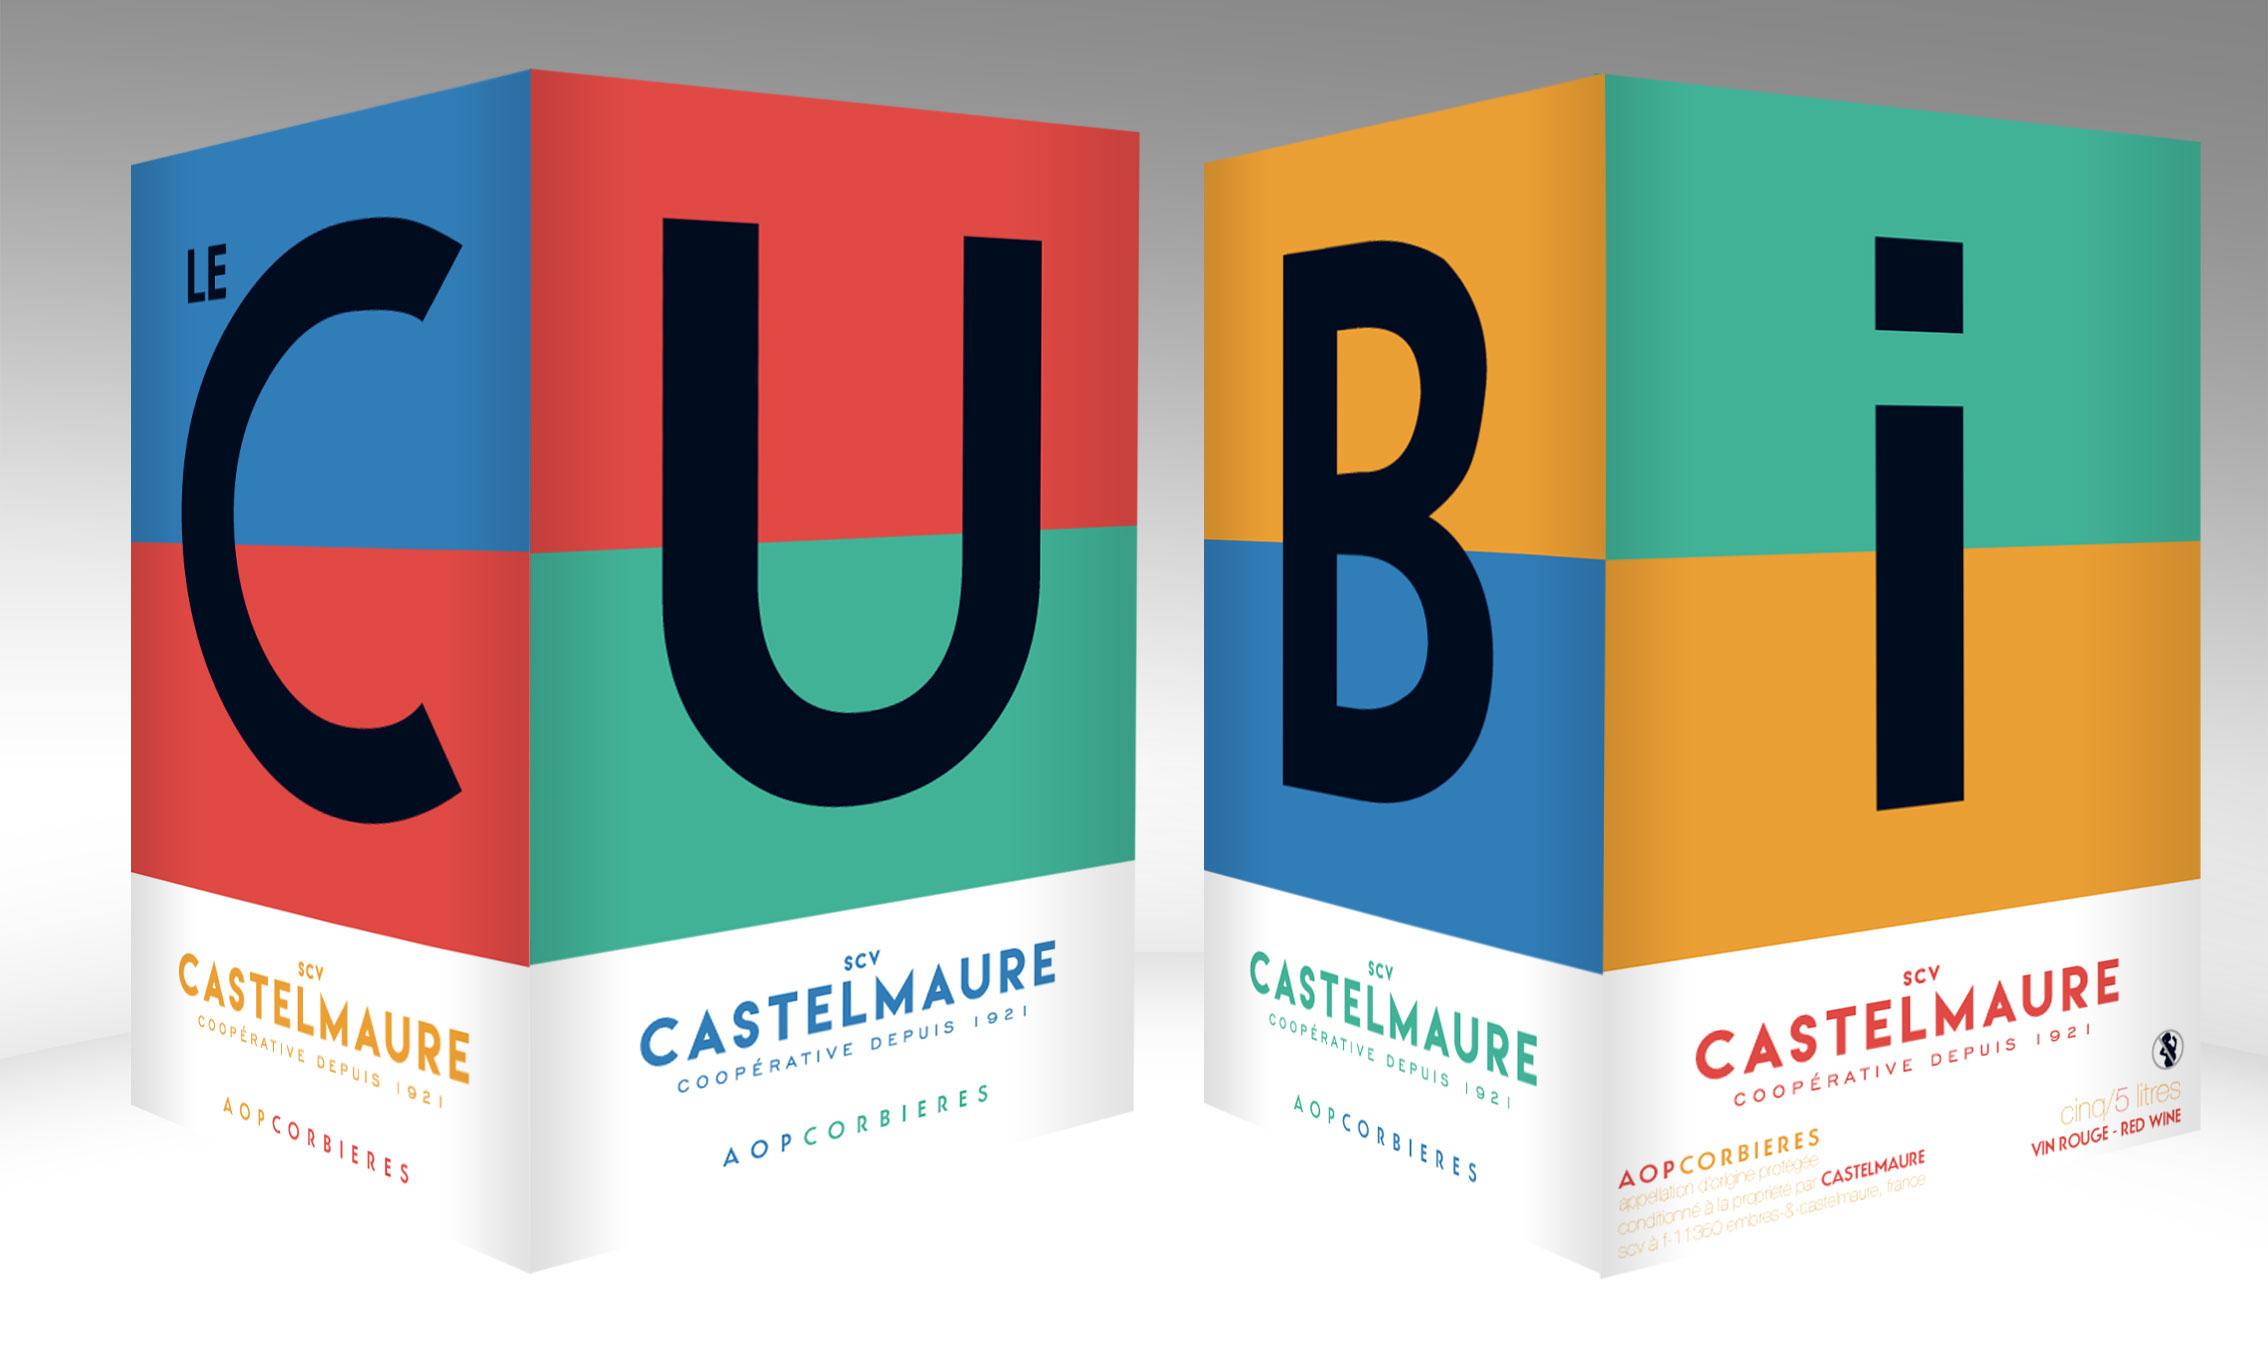 bib Castelmaure